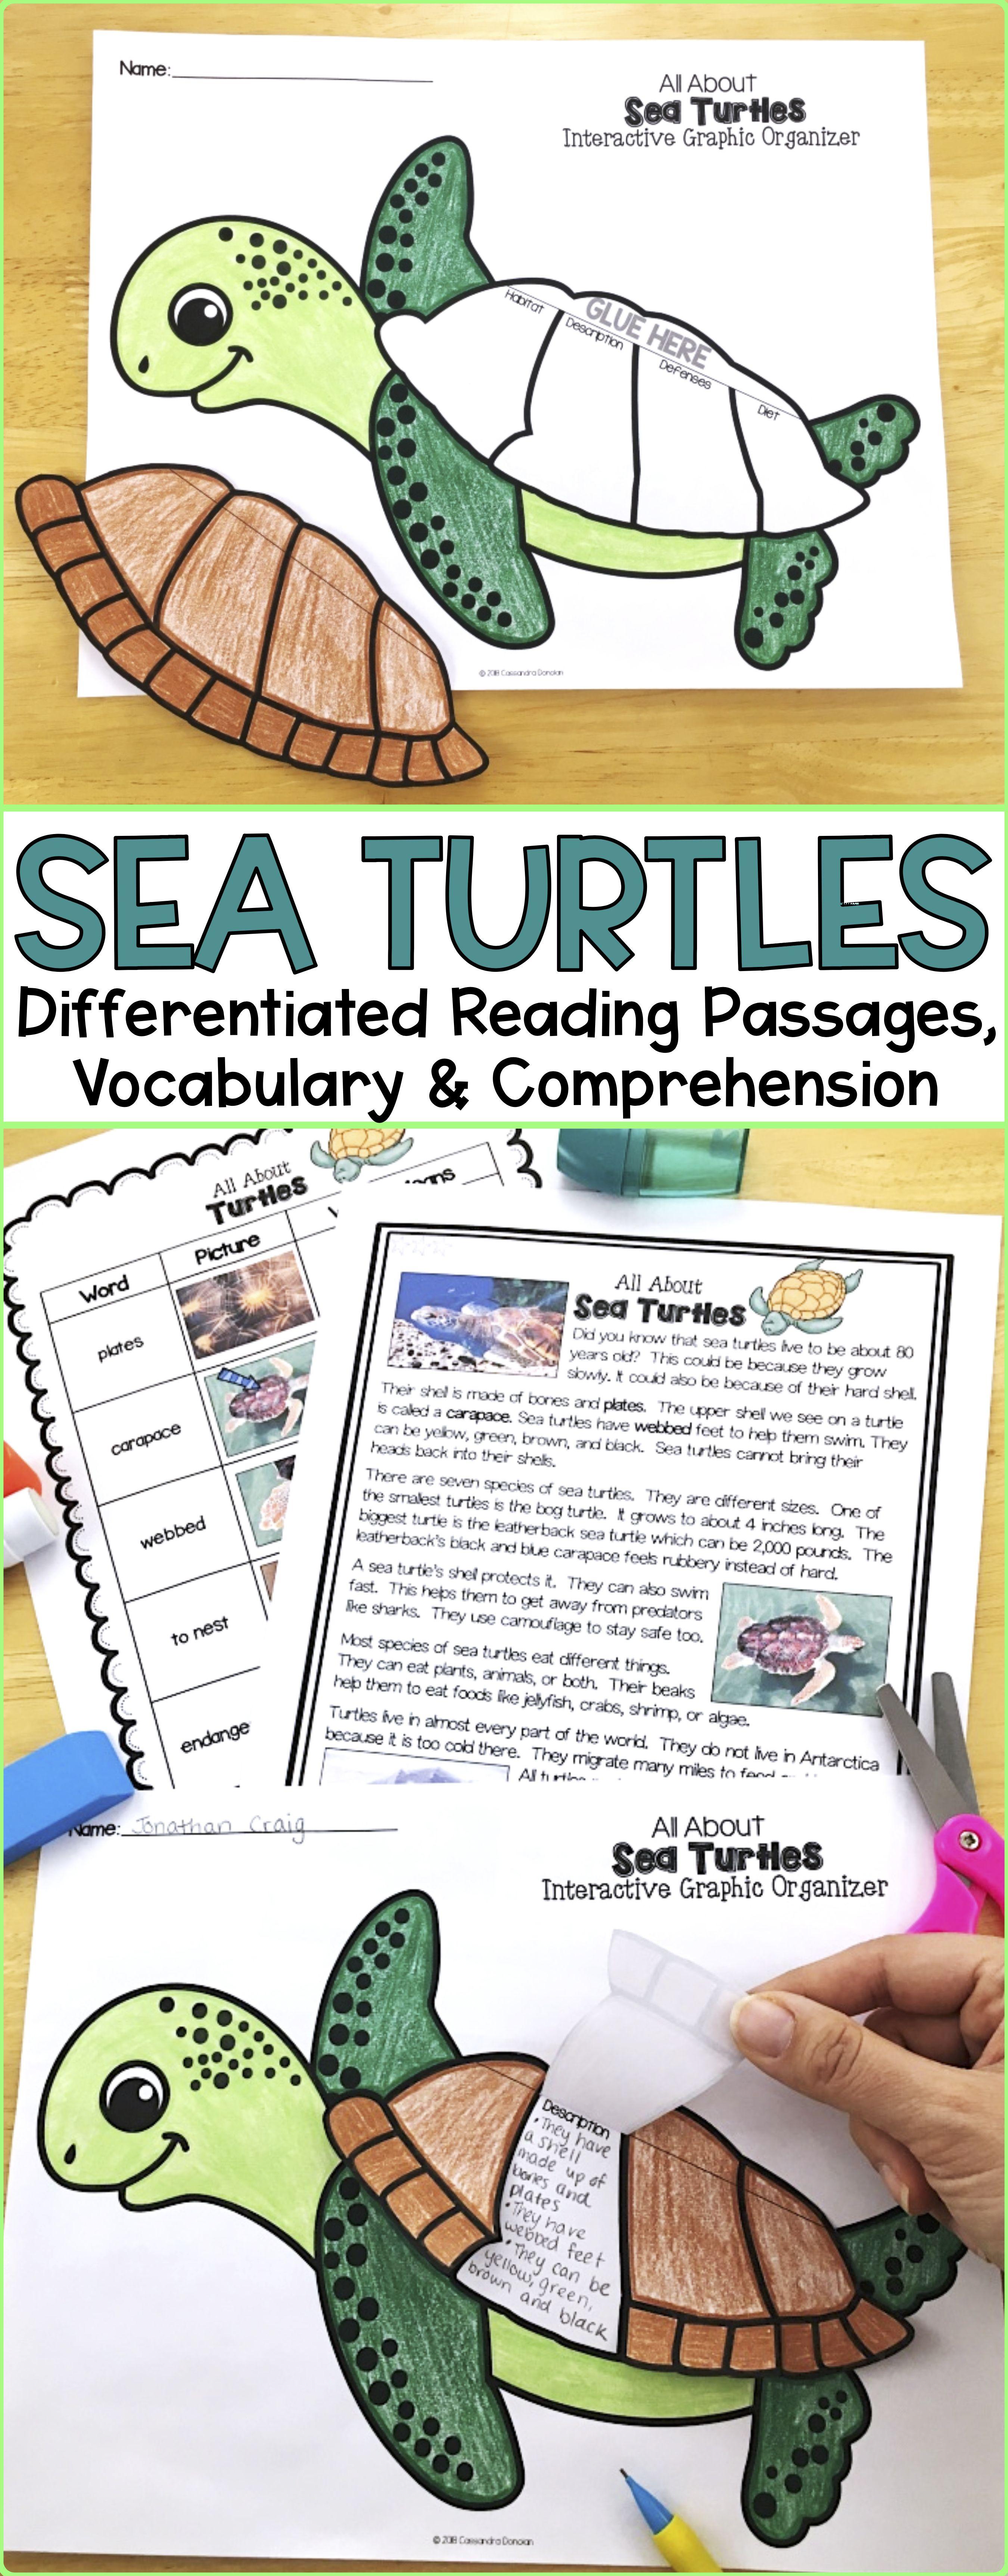 Ocean Animals Reading Sea Turtles Differentiated Passages